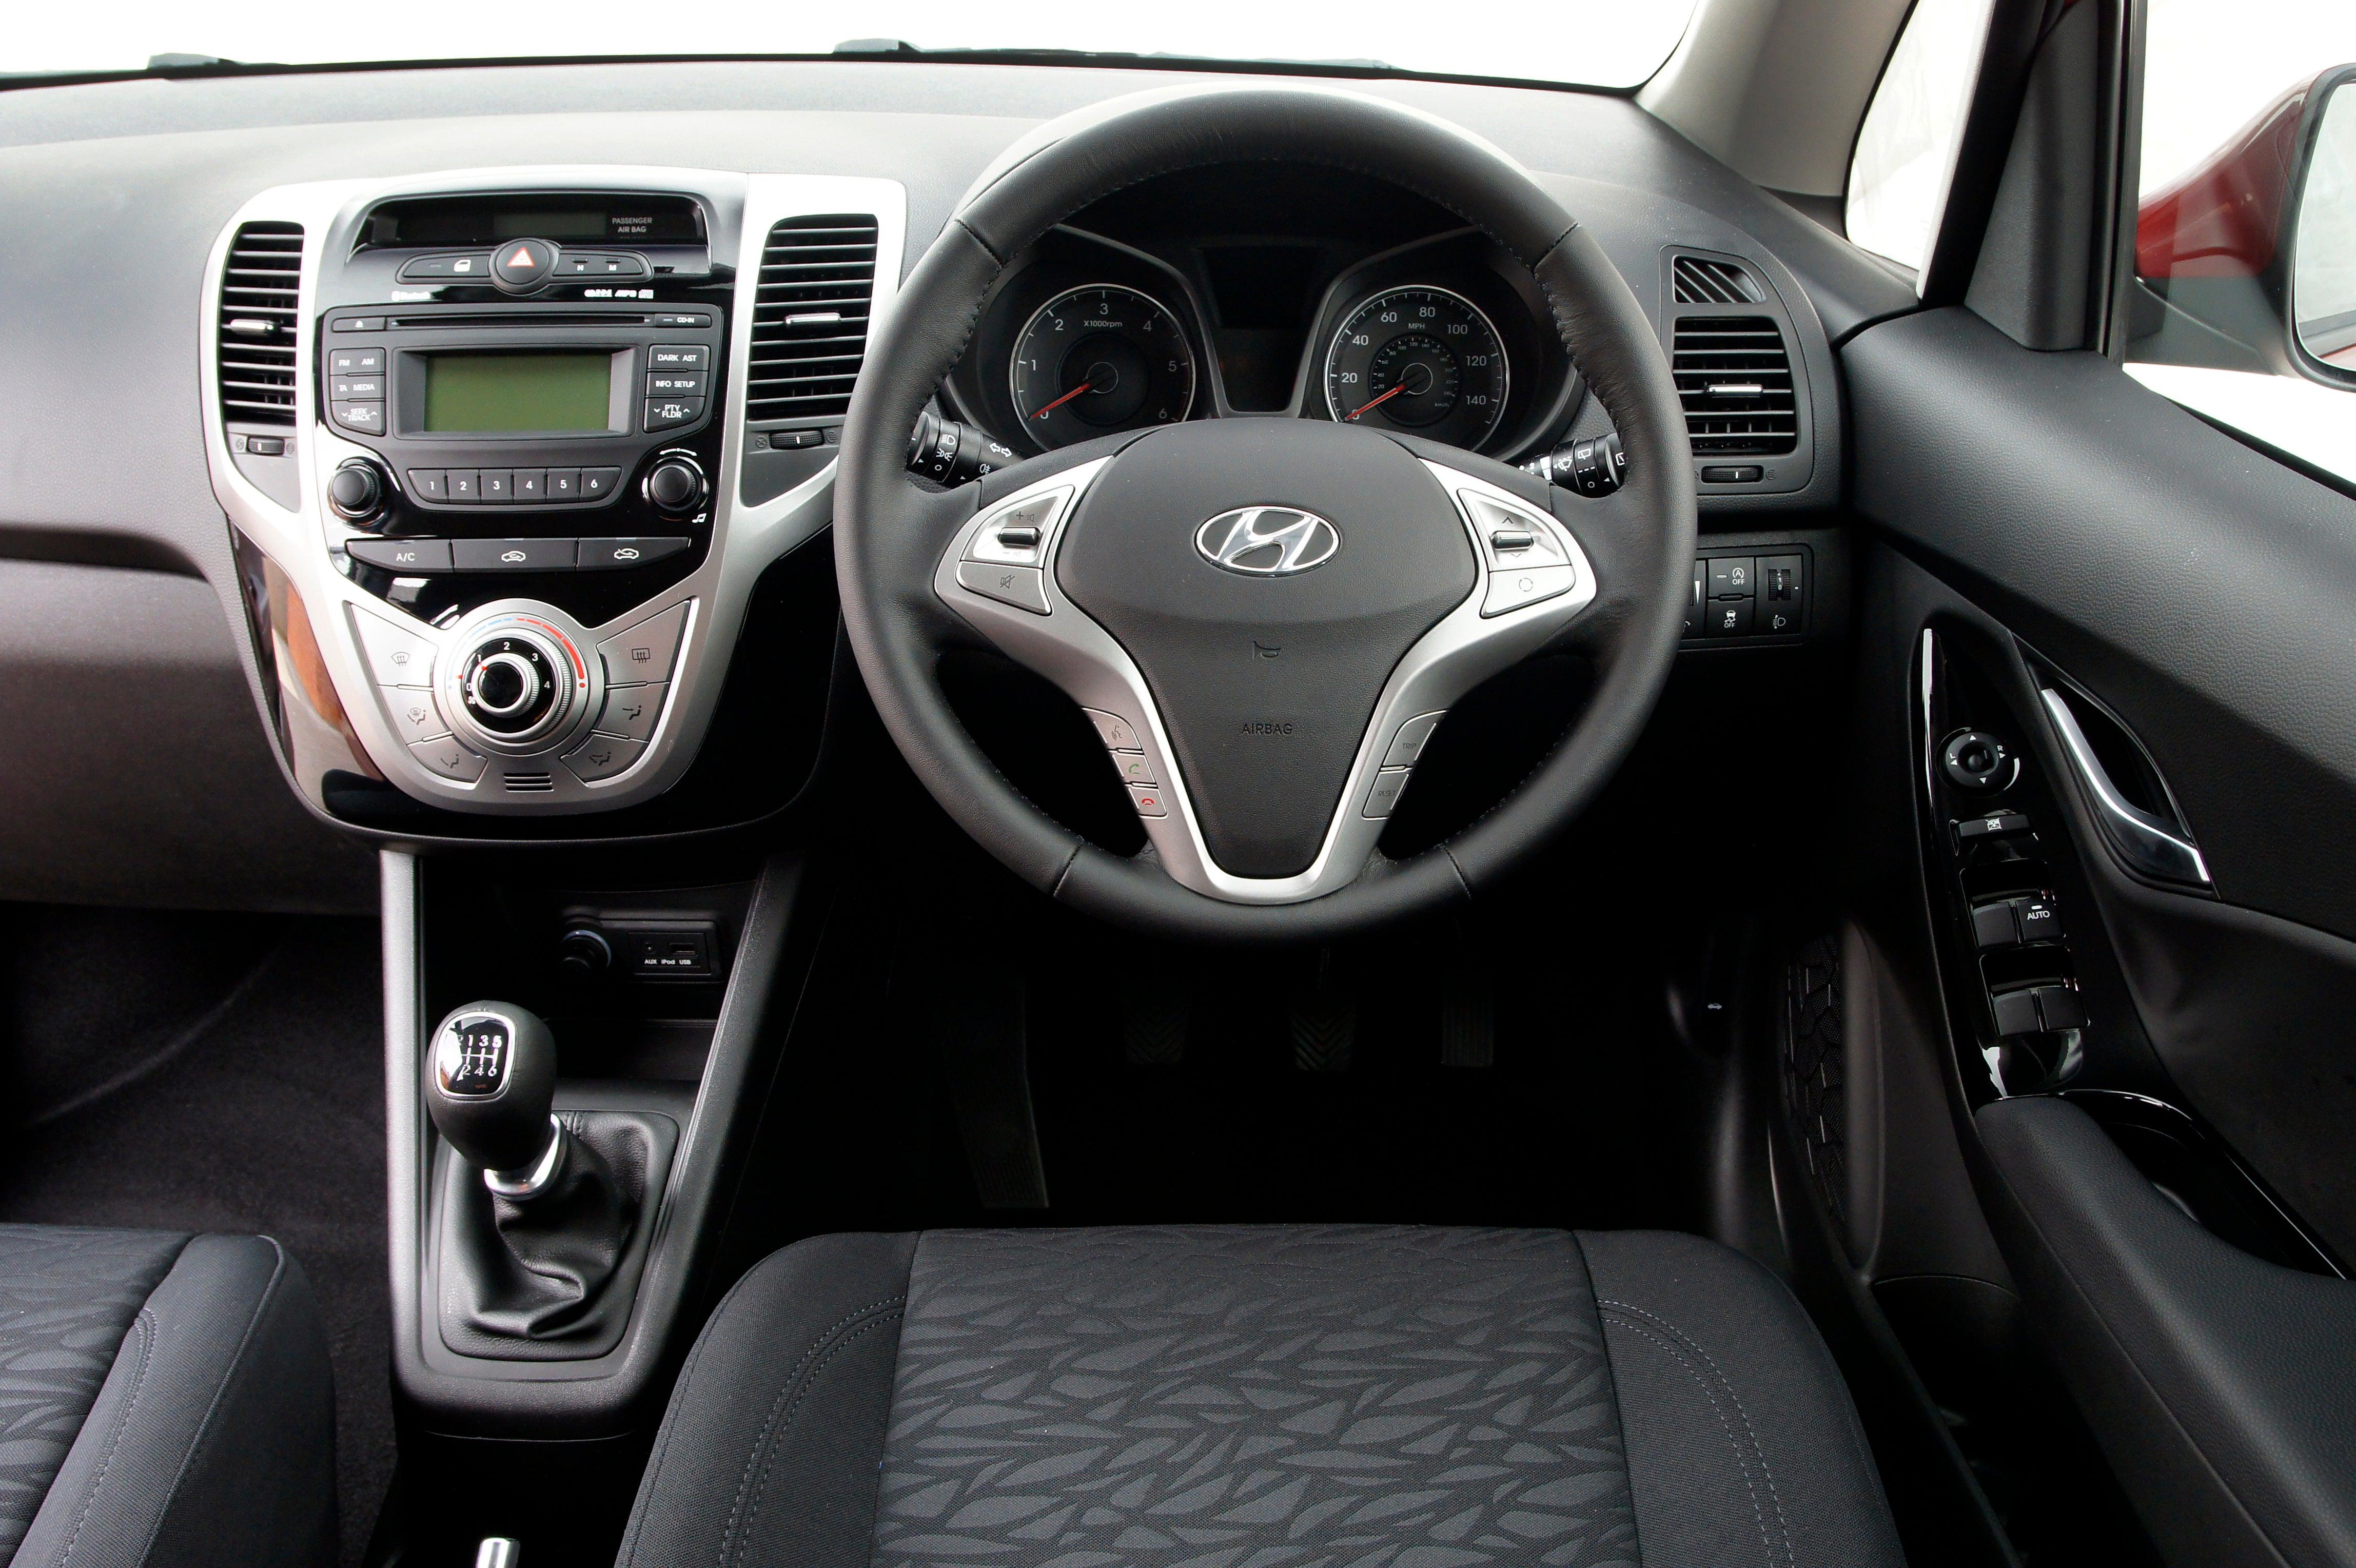 Hyundai ix20 front interior